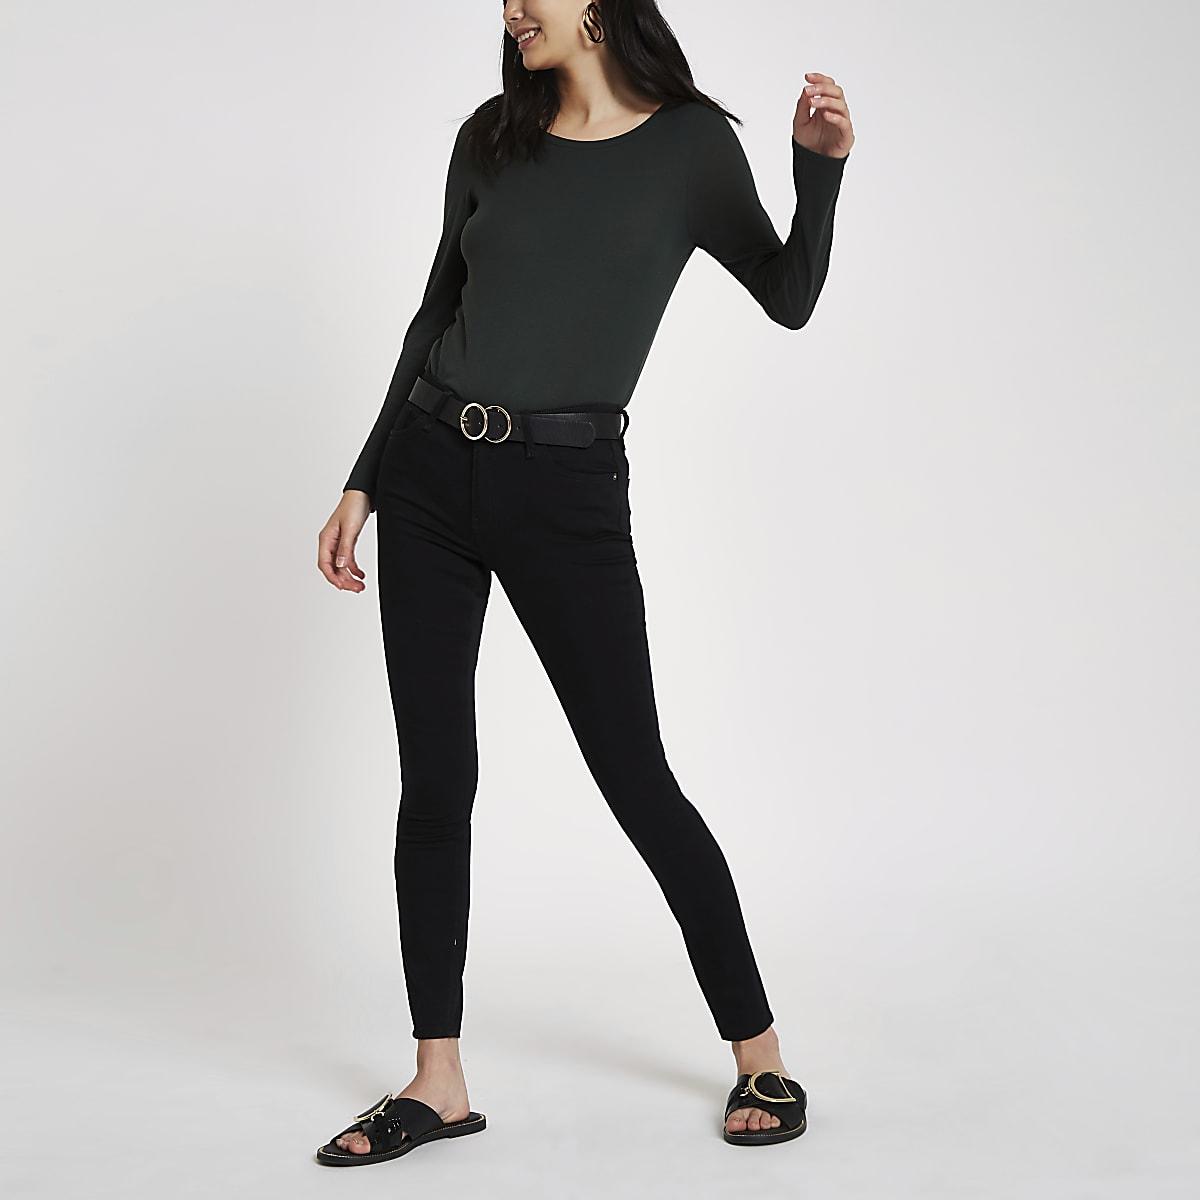 Green scoop neck long sleeve T-shirt